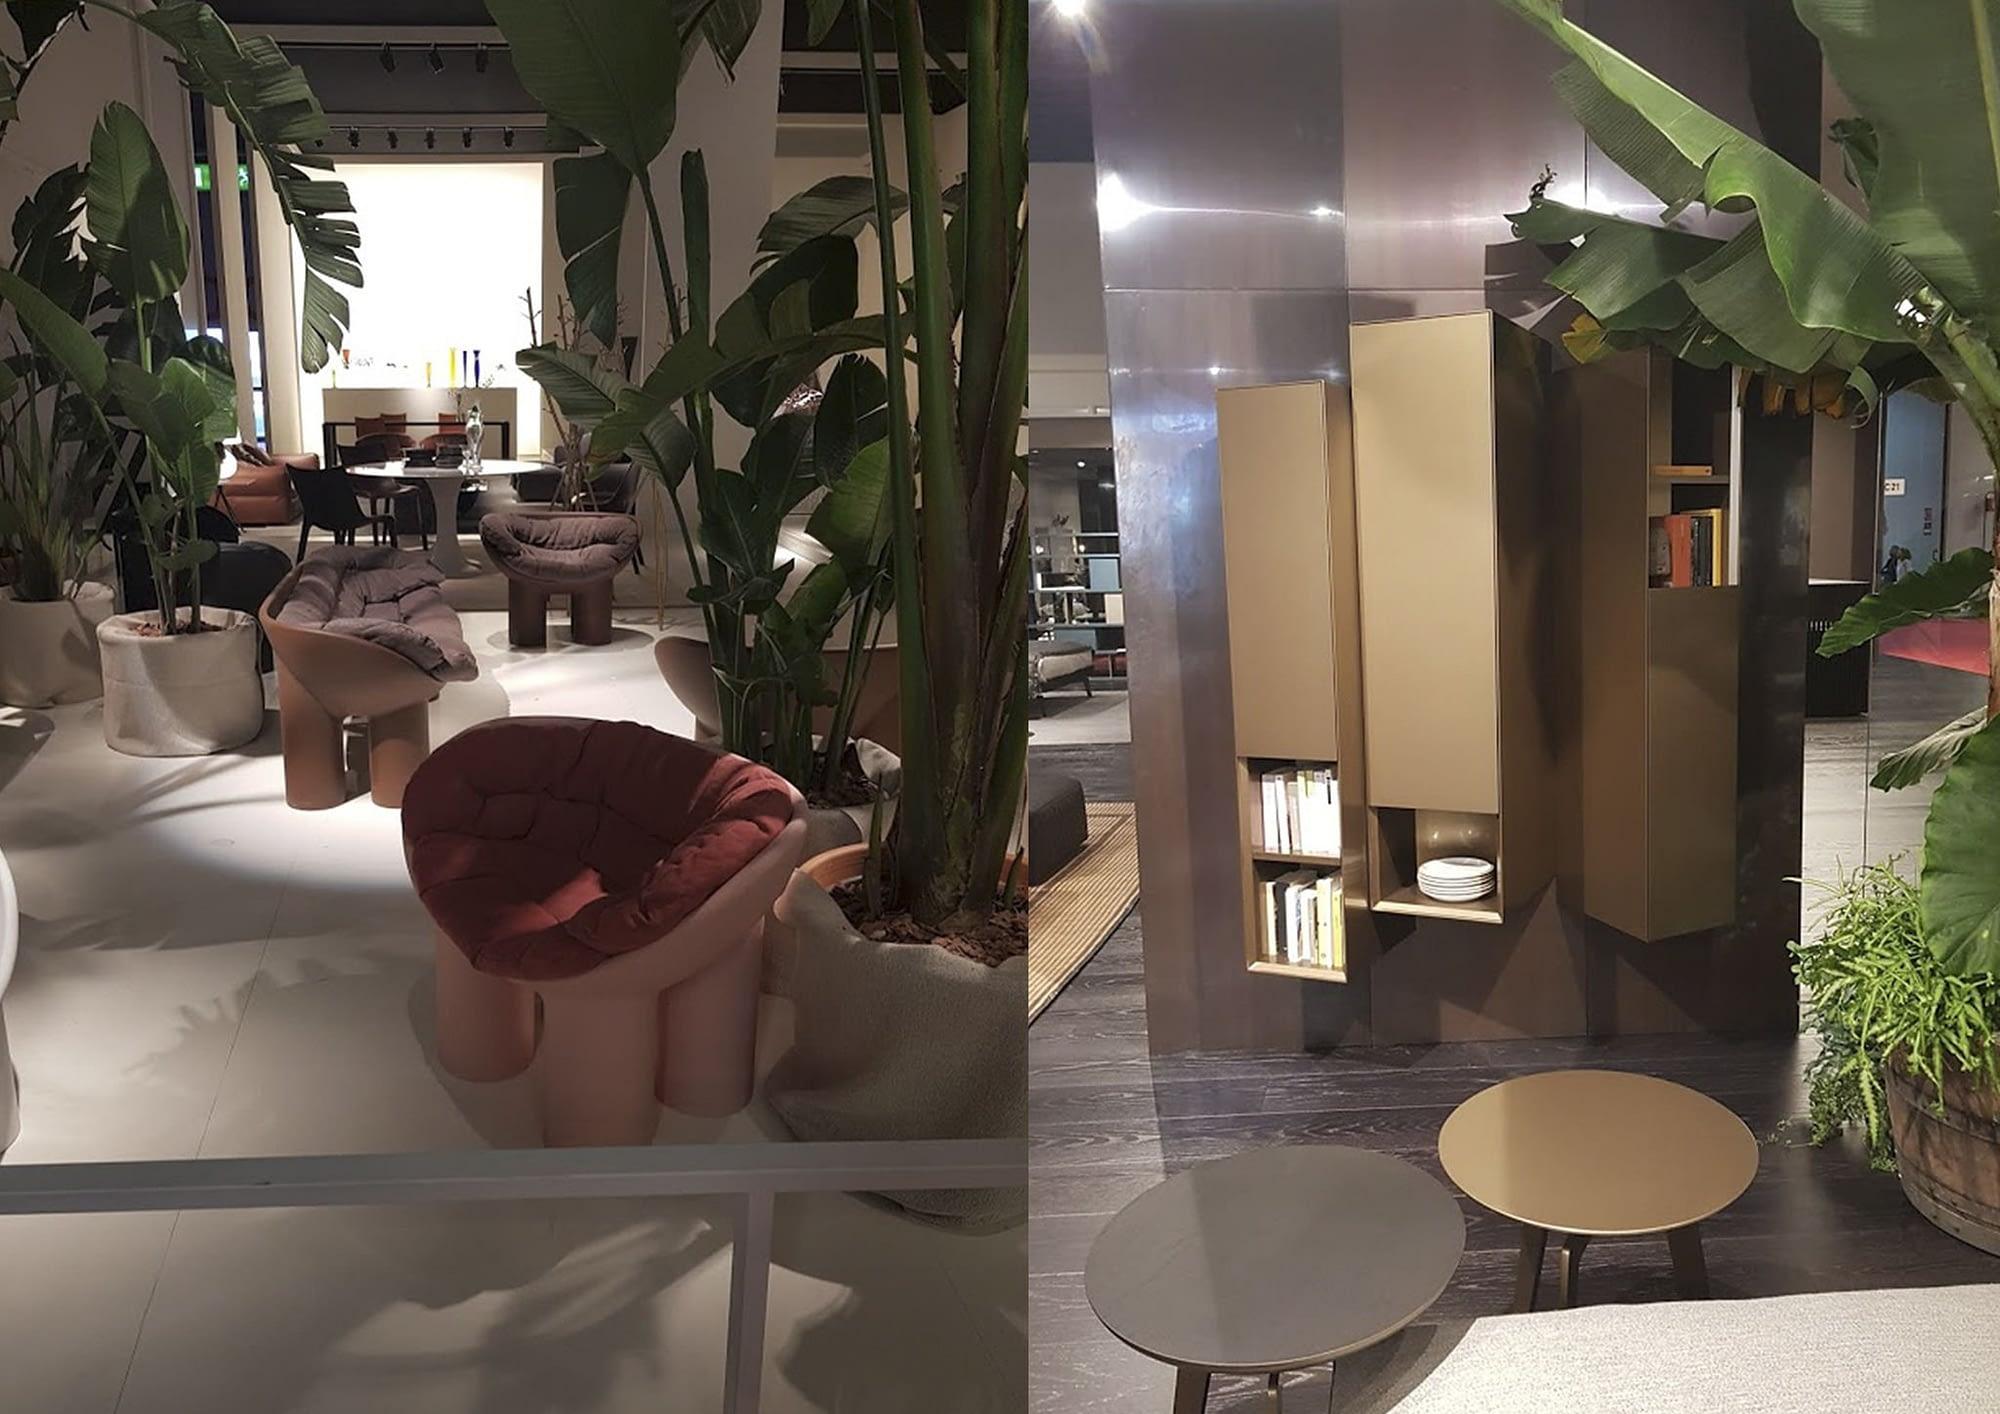 Milano Design Week 2018 - Salone del Mobile 95